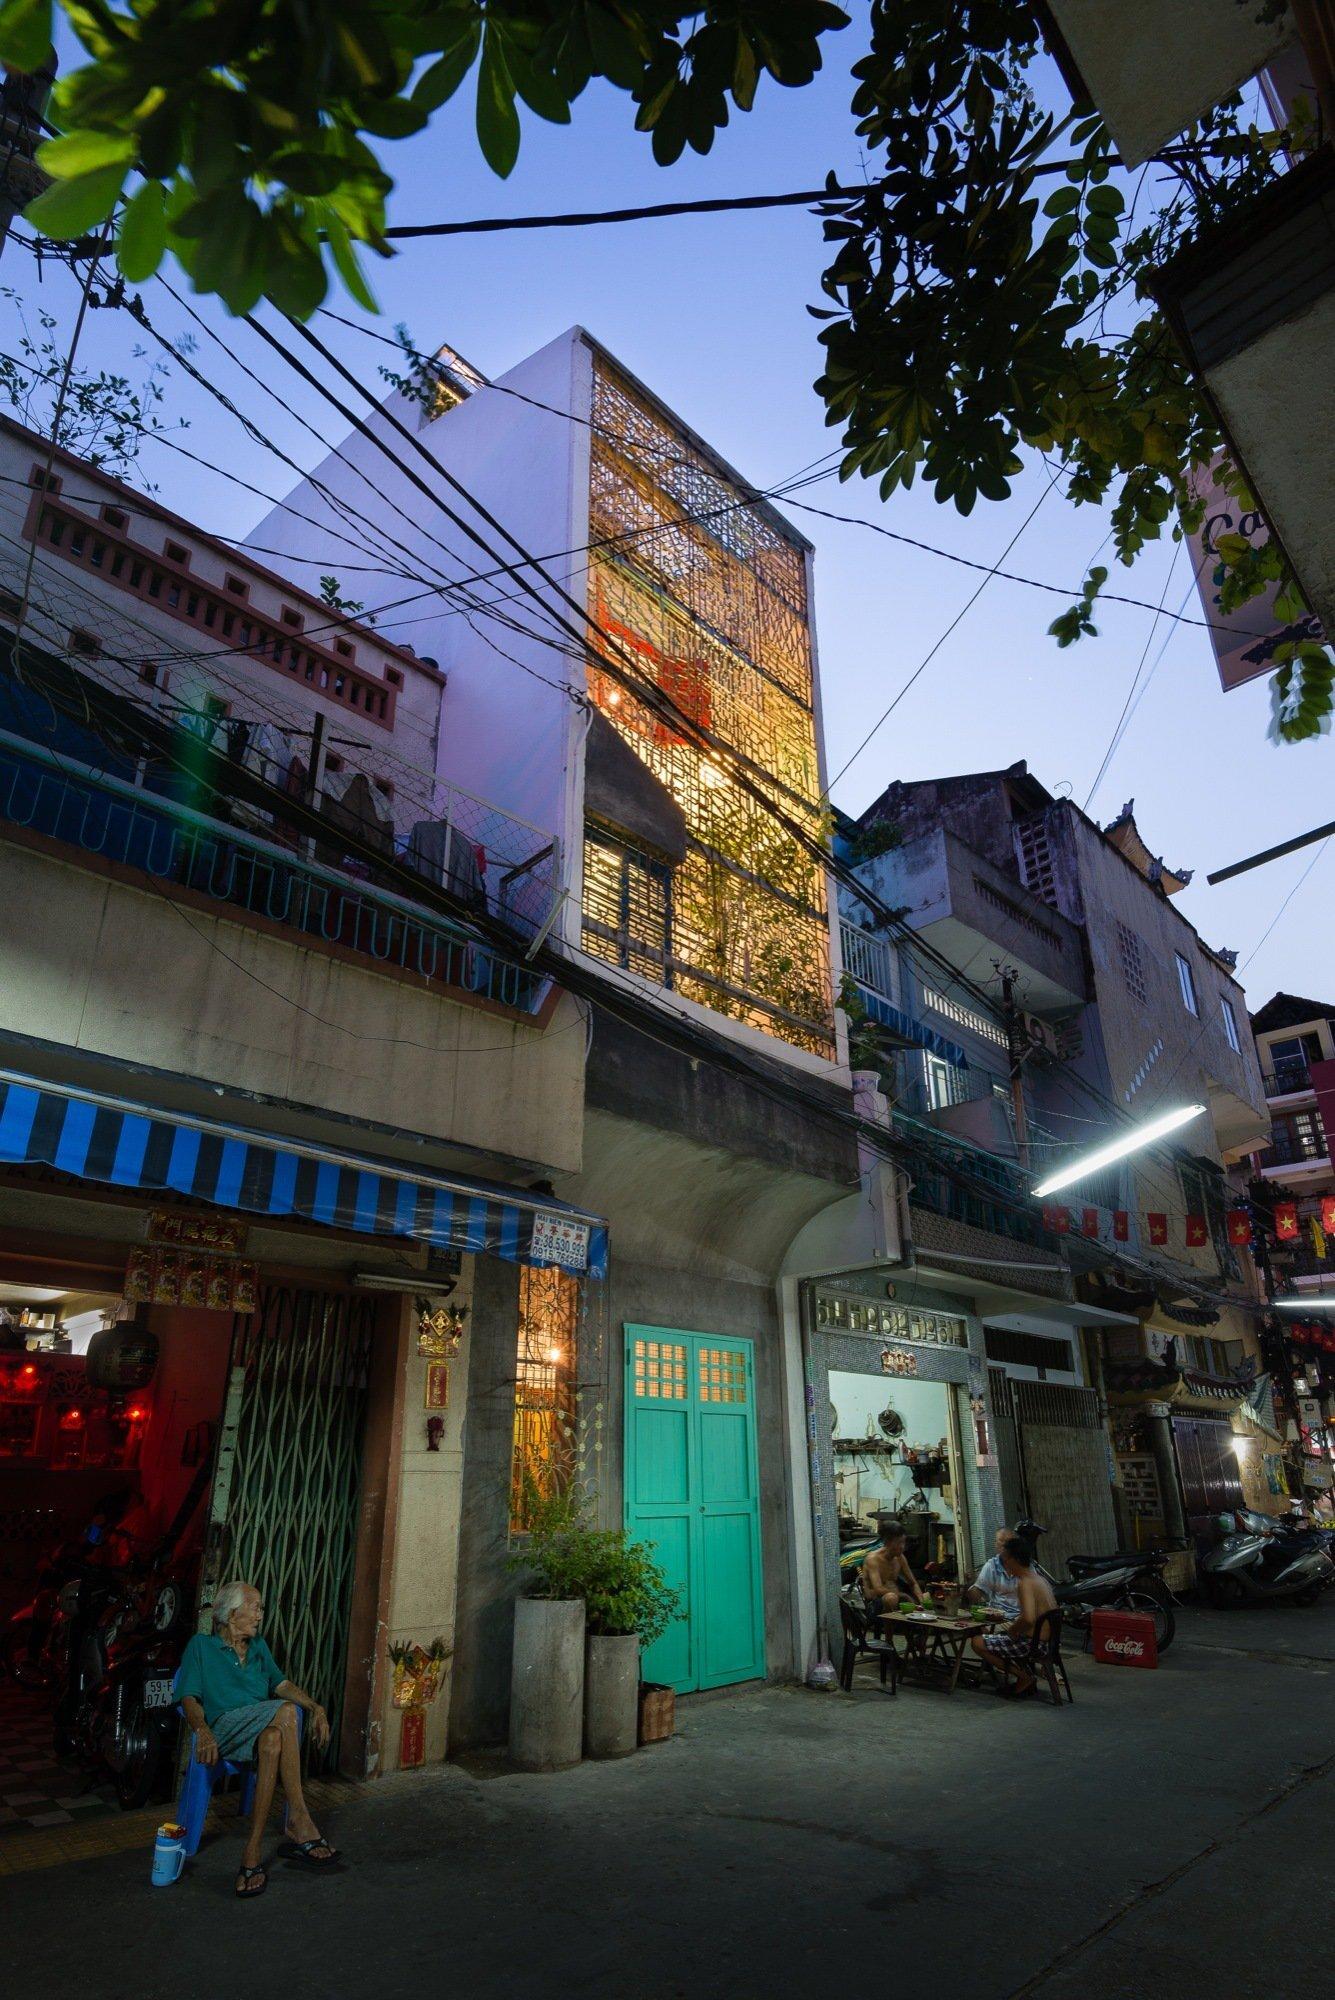 Saigon House - Small House - a21studio - Vietnam - Exterior - Humble Homes